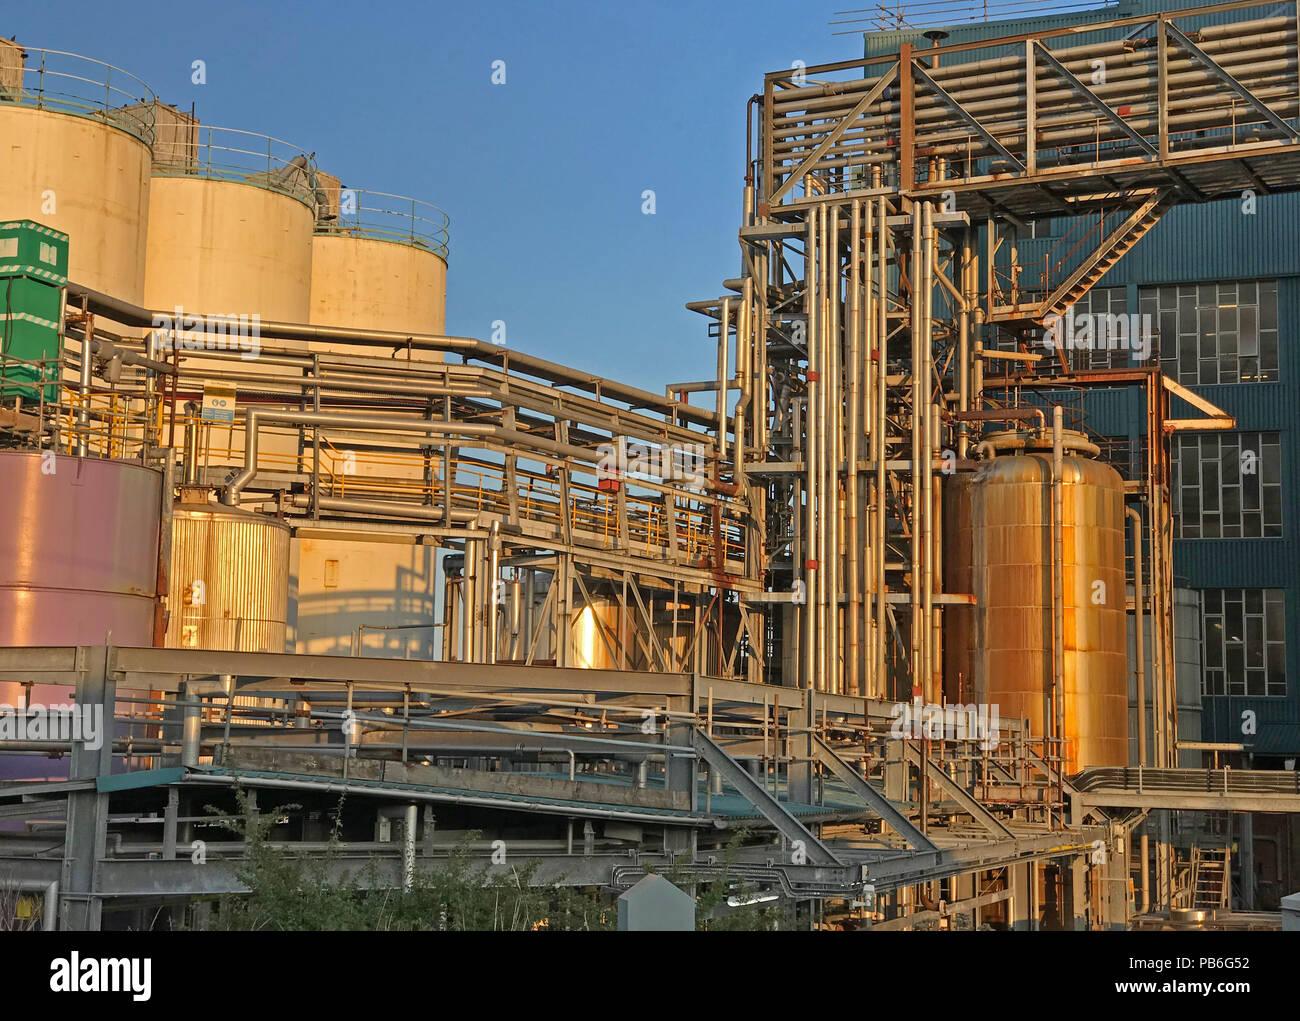 @HotpixUK,GoTonySmith,soap,Chemical,Lever,Brothers,Ltd,Warrington